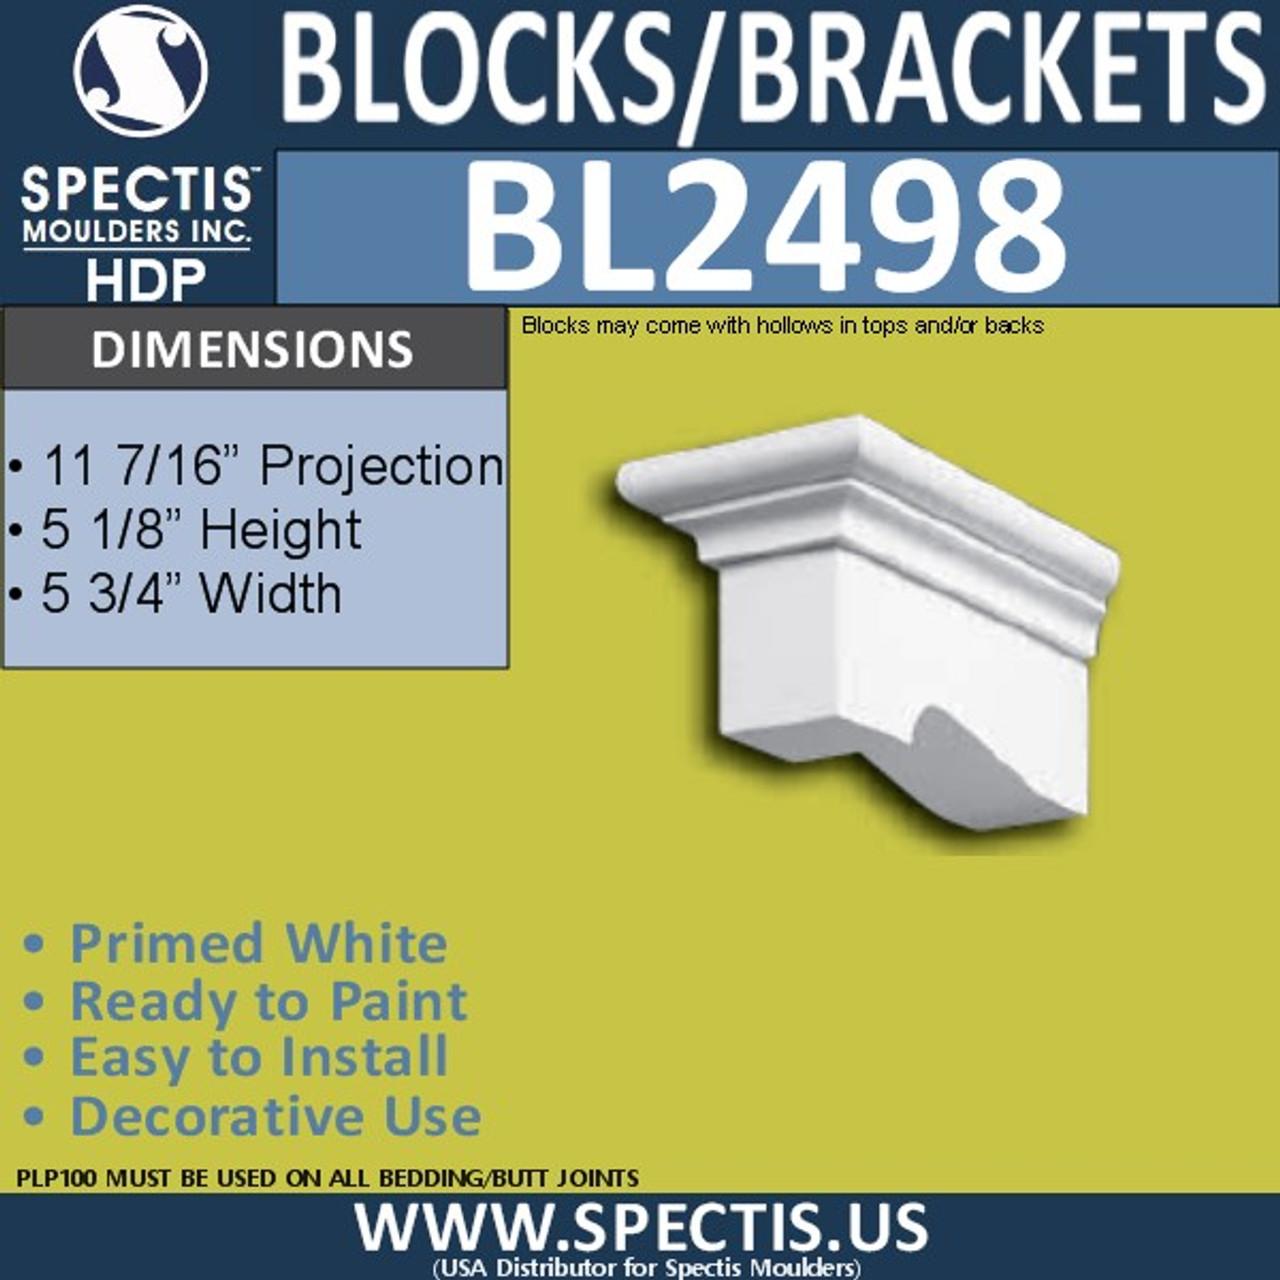 "BL2498 Eave Block or Bracket 5.5""W x 5.2""H x 11"" P"